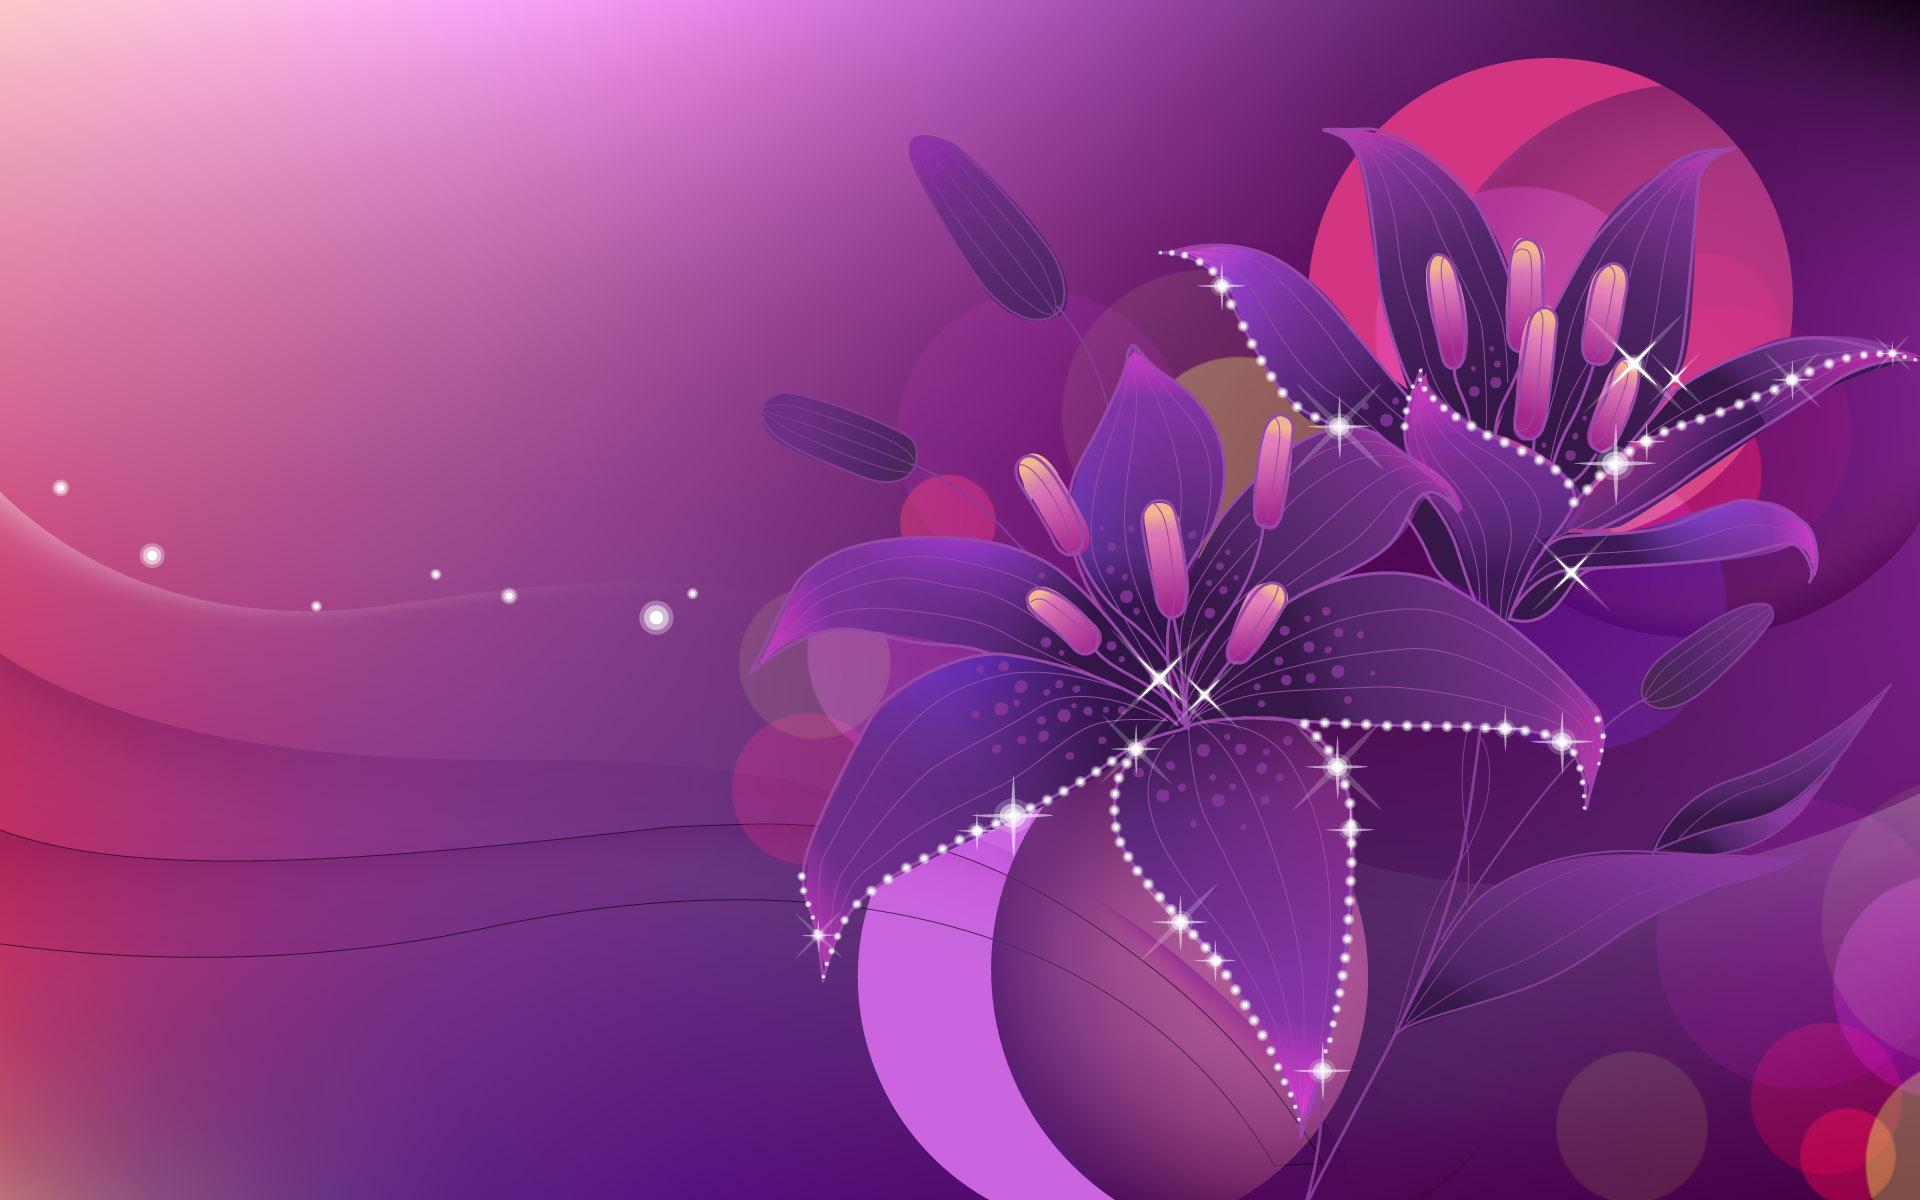 Flower Design Wallpaper 7192 Hd Wallpapers In Vector N Designs